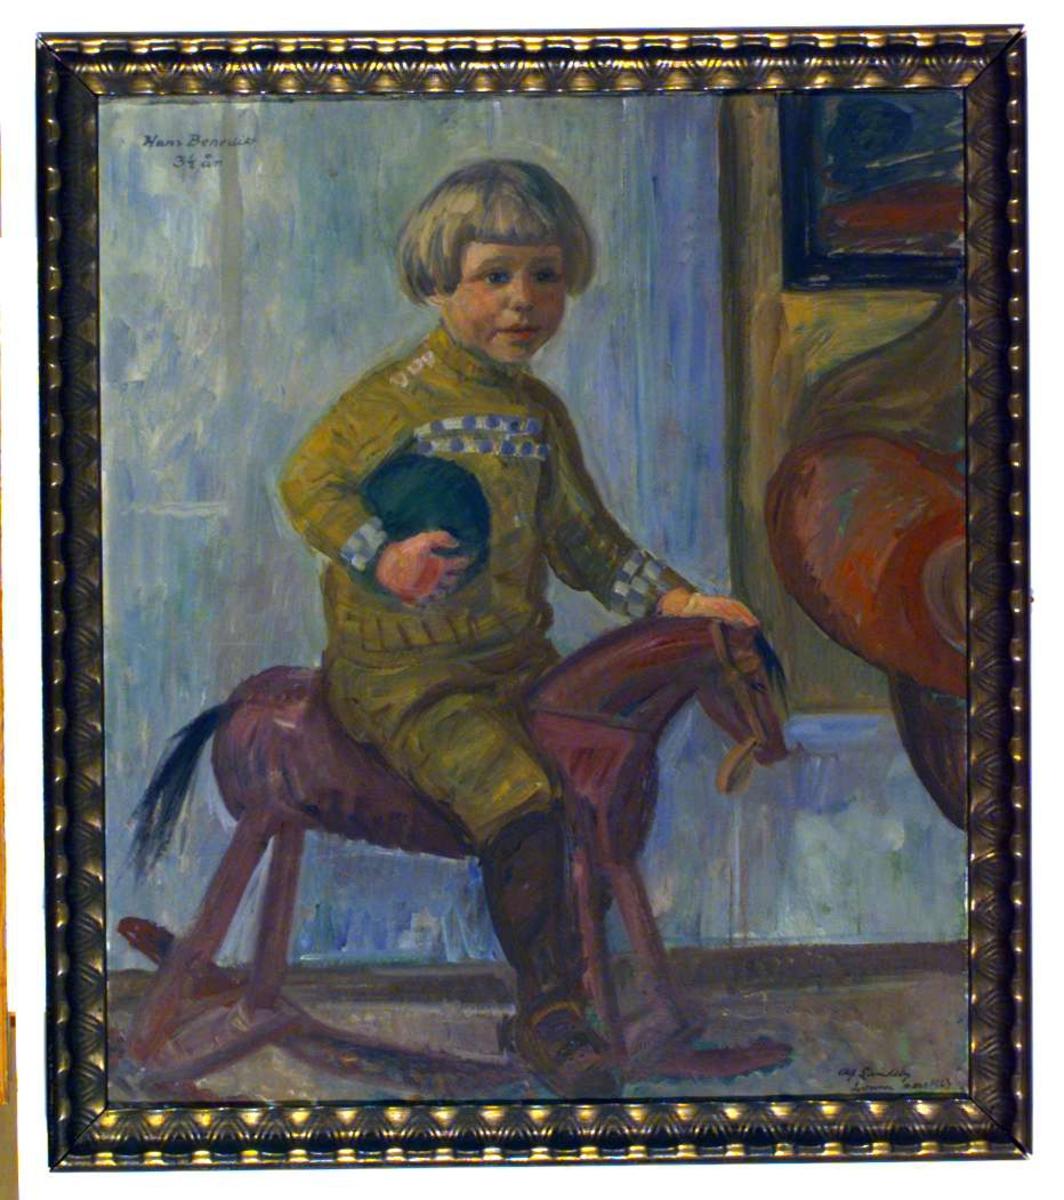 Hans Benedict på gyngehesten, 3,5 år gammel.